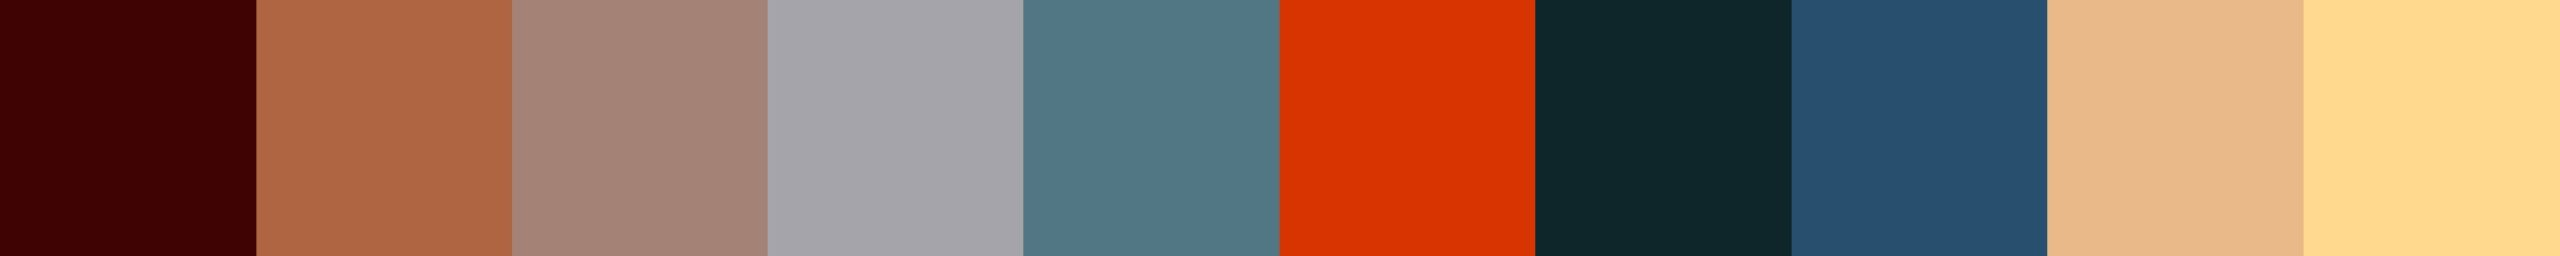 295 Ruminata Color Palette